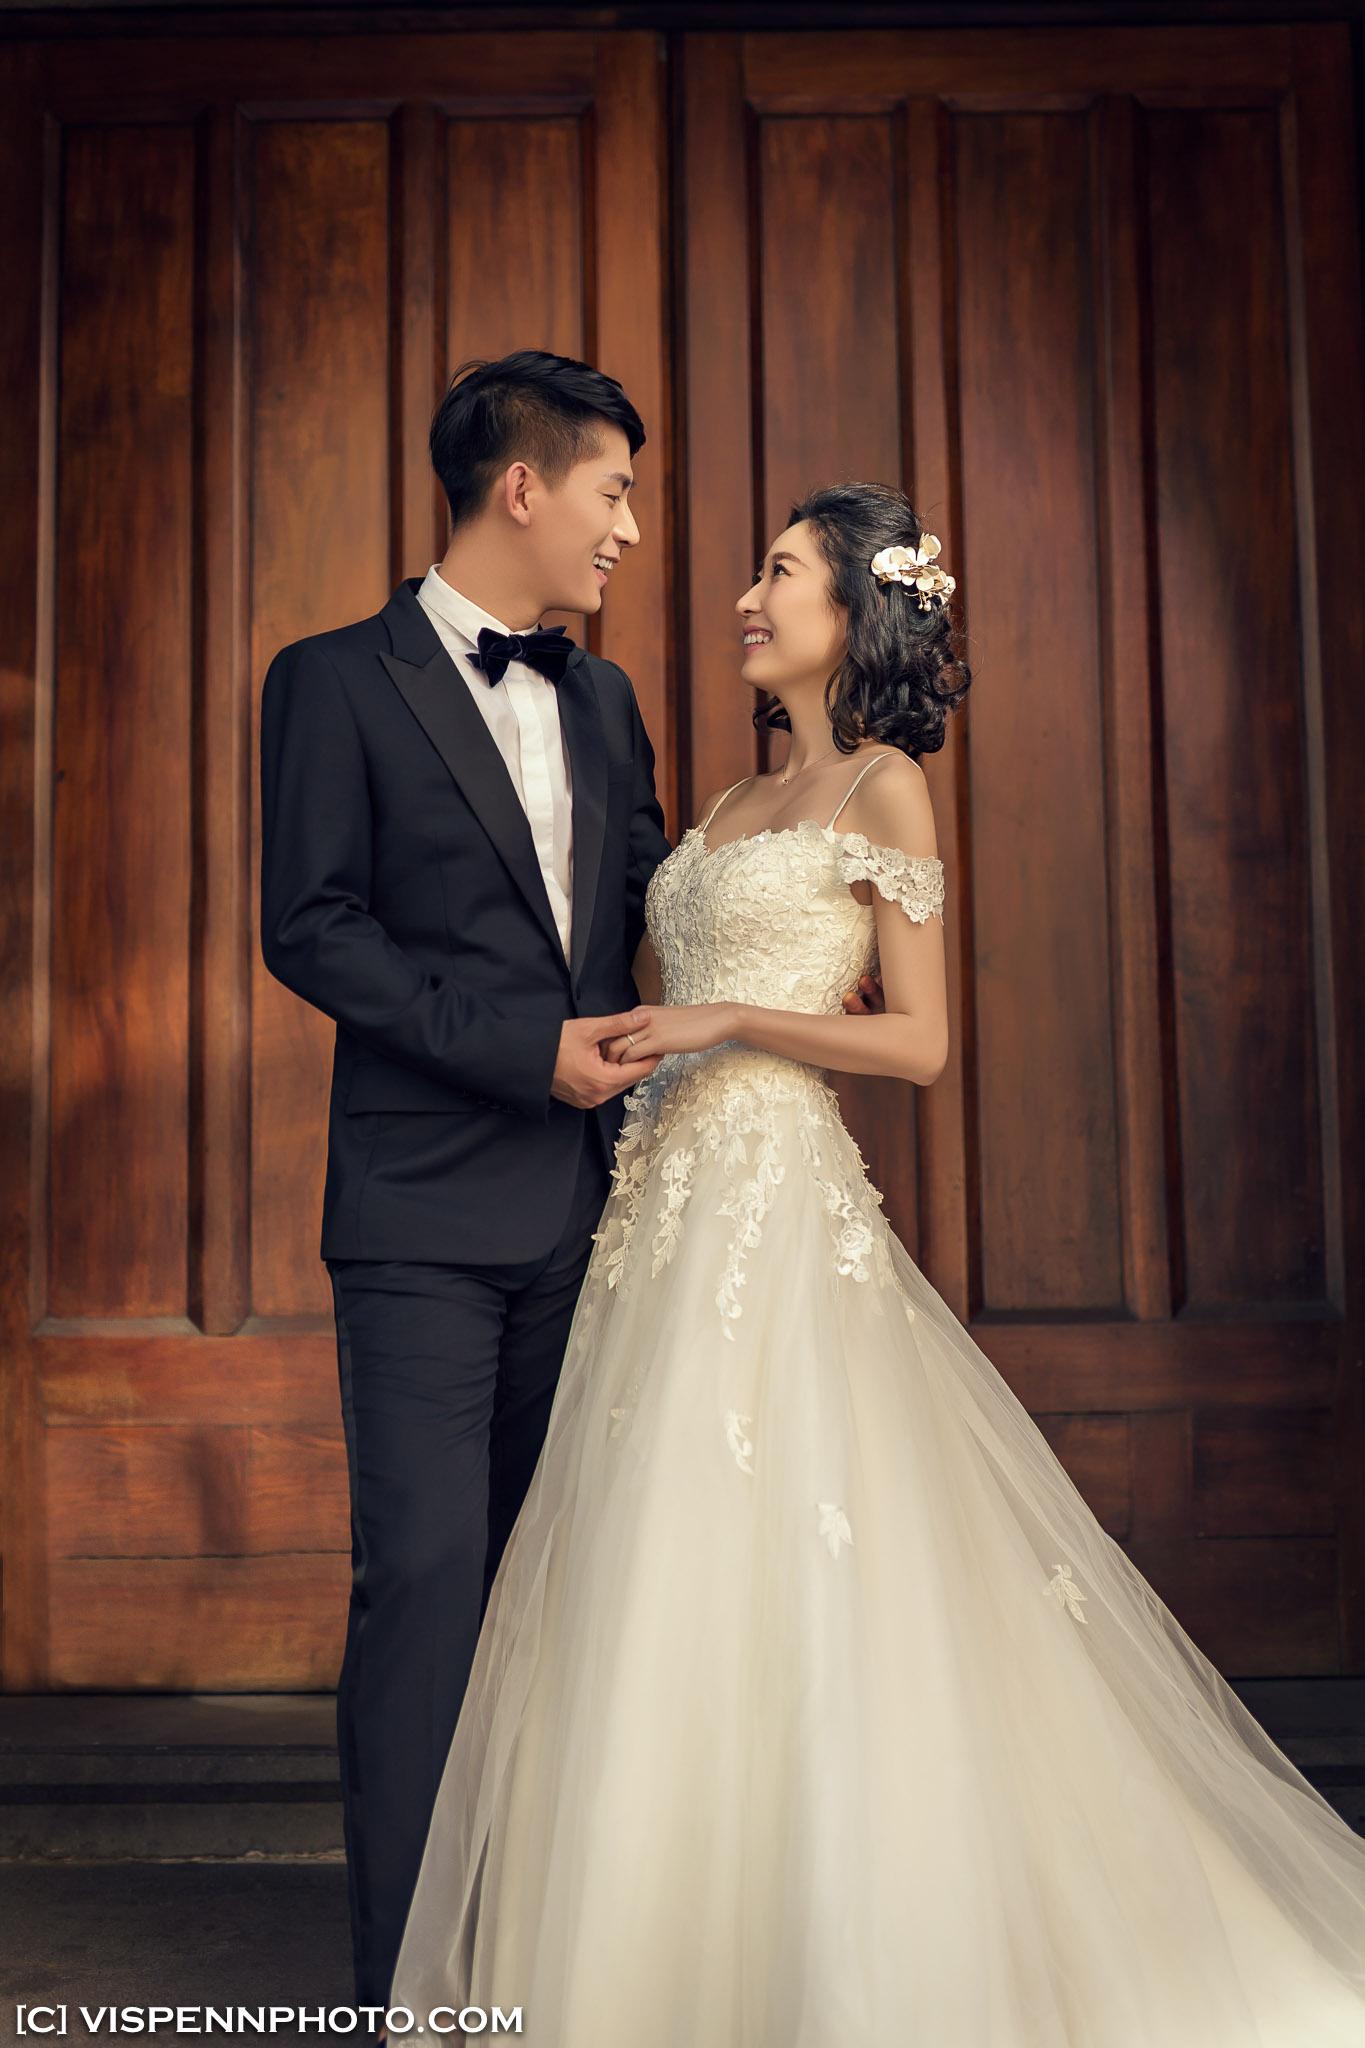 PRE WEDDING Photography Melbourne VISPENN 墨尔本 婚纱照 结婚照 婚纱摄影 1R9A6006